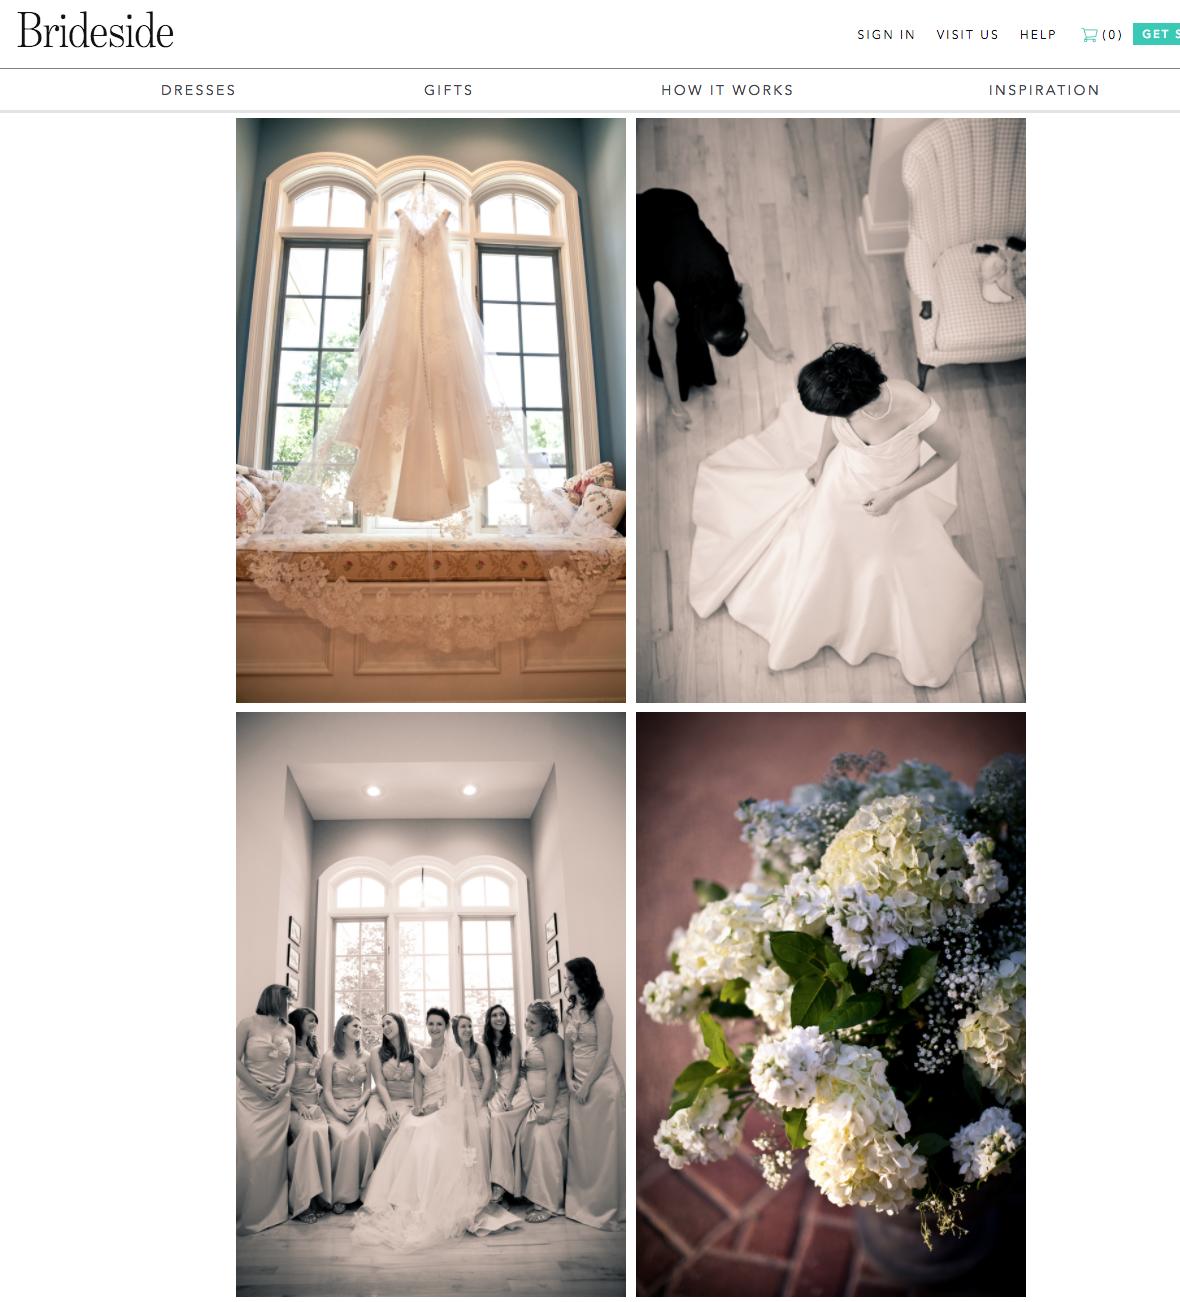 Brideside Real Weddings - Lake of the Ozarks, MO